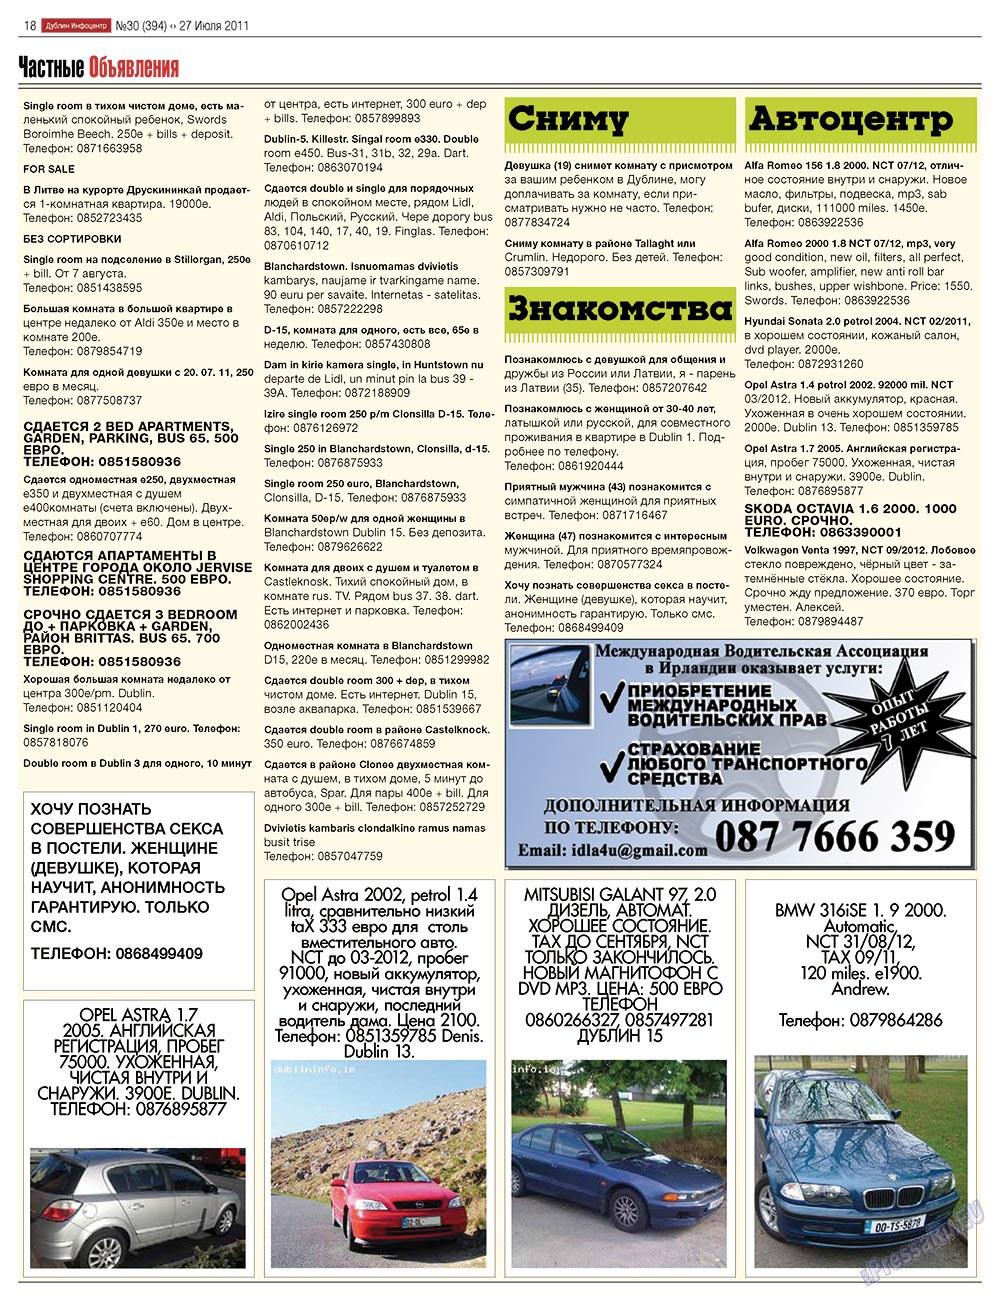 Дублин инфоцентр (газета). 2011 год, номер 30, стр. 18